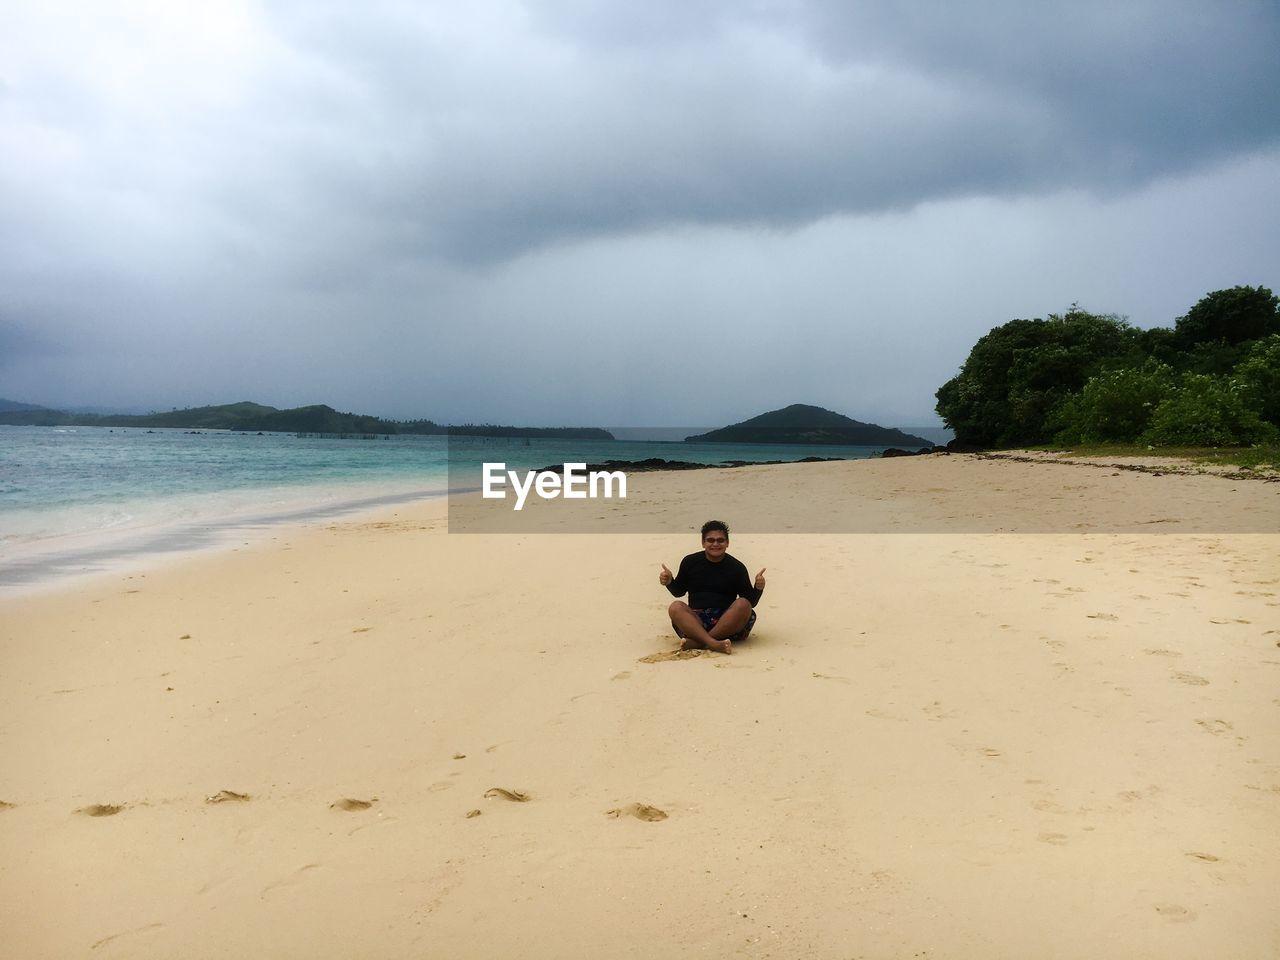 Man sitting on sand against cloudy sky at beach